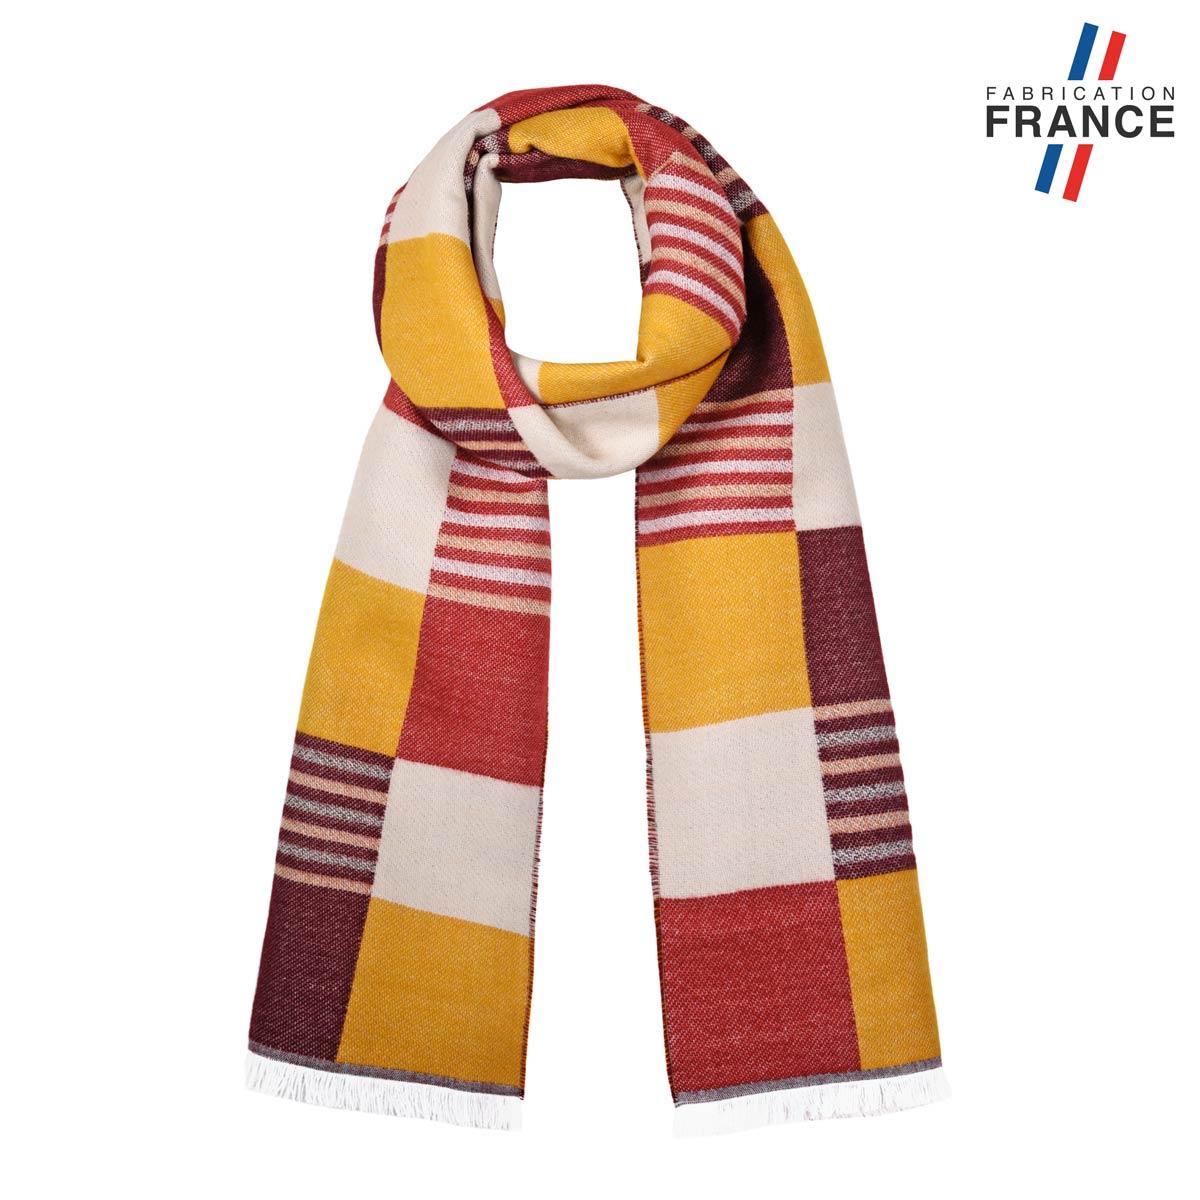 AT-05691_F12-1FR_Echarpe-femme-carreaux-fabrication-en-france